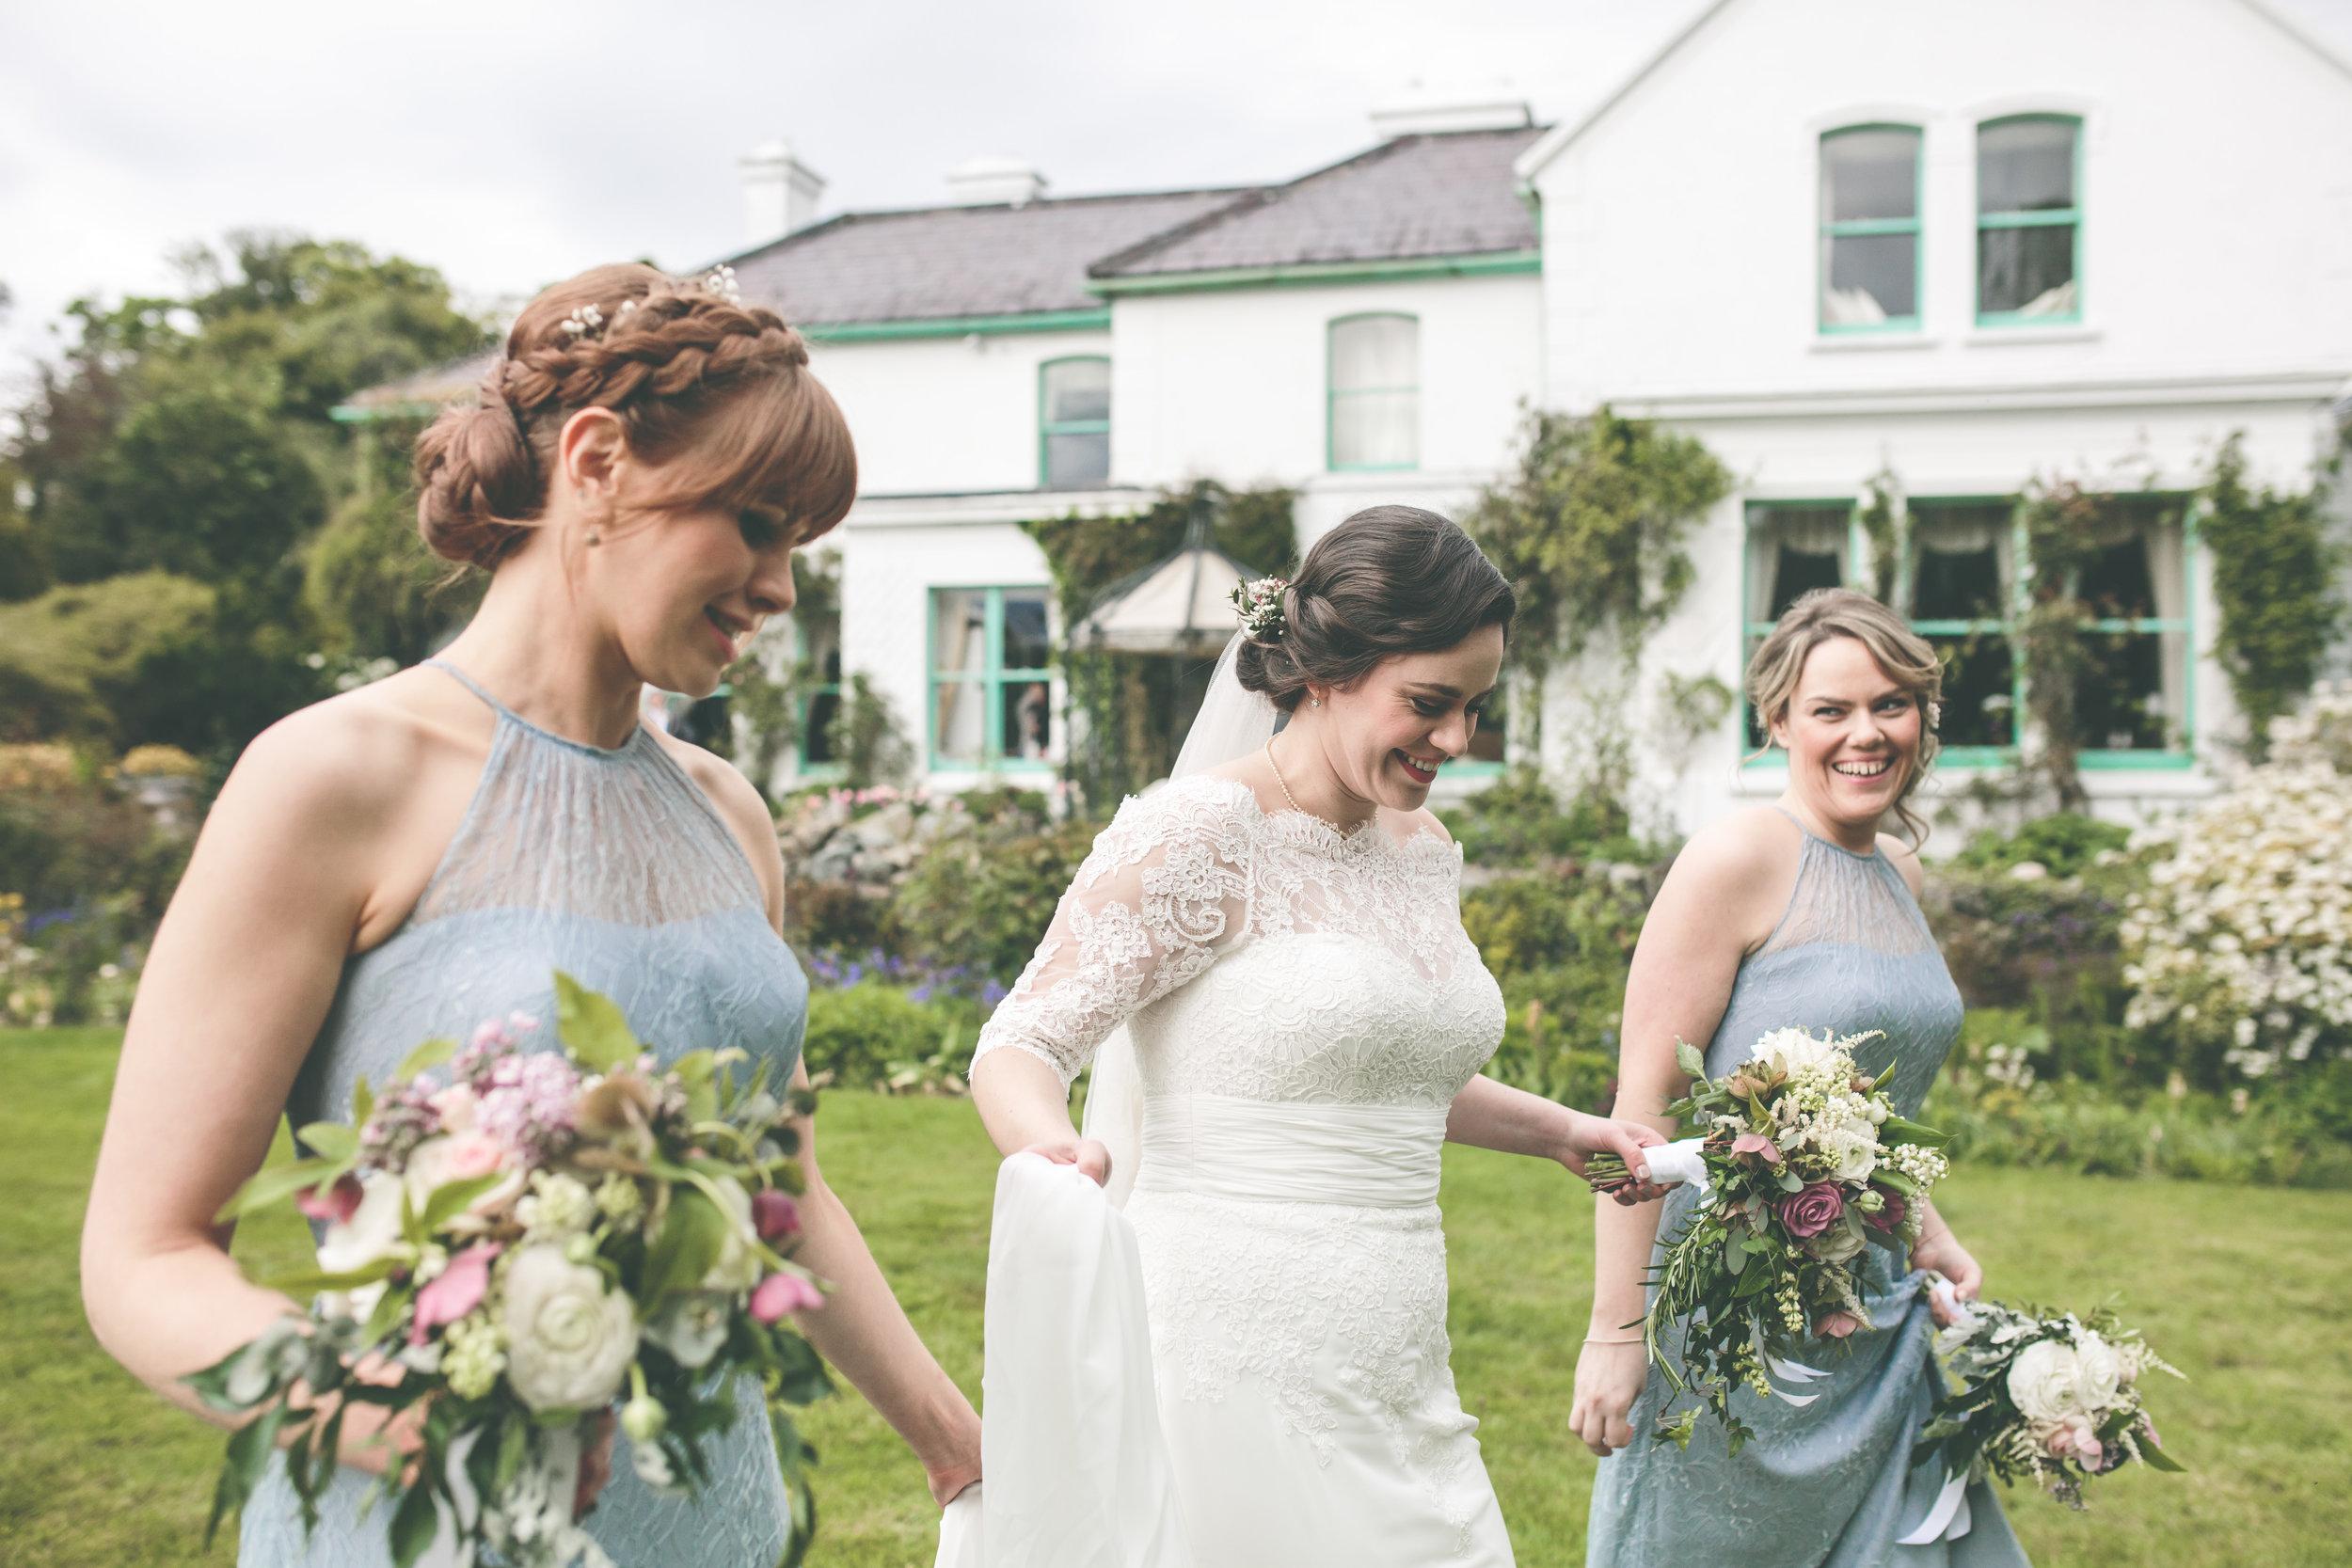 Anna_Mark_Cashel_Connemara_Olivia_Moon_Wedding_Photography-255.jpg